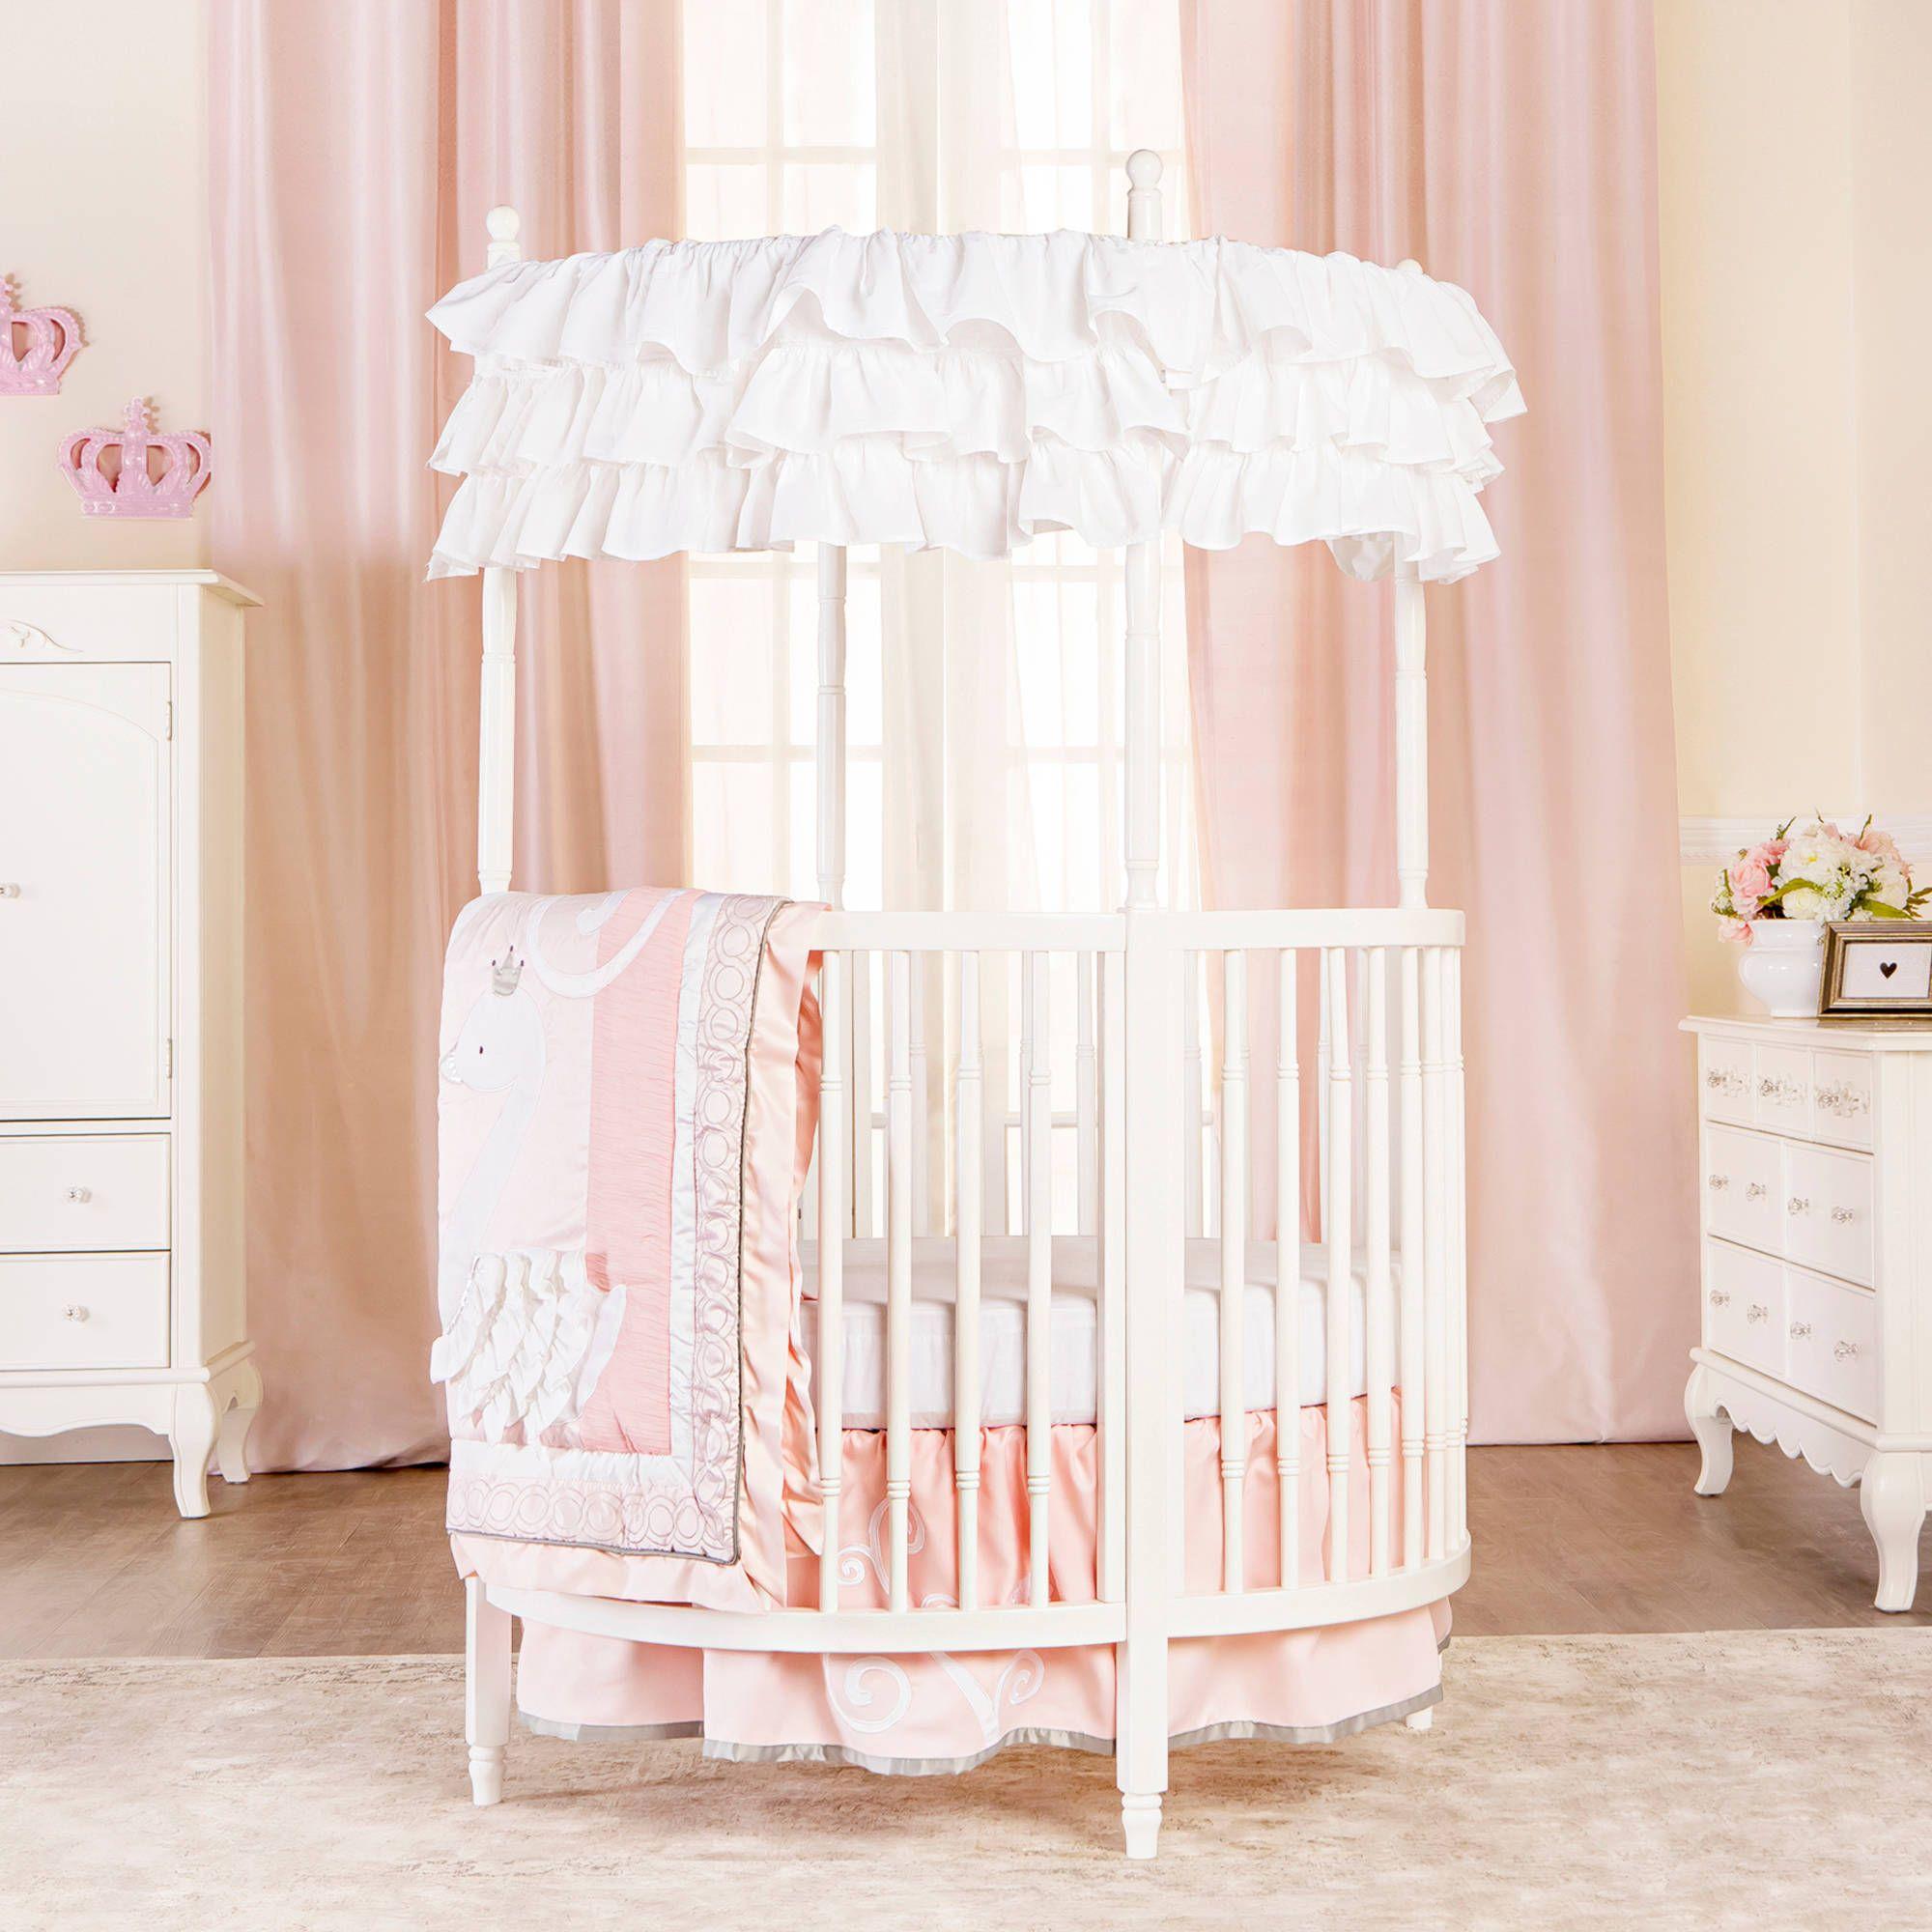 Free 2 Day Shipping Buy Dream On Me Sophia Posh Circular Mini Crib White At Walmart Com In 2020 Circular Crib Round Crib Bedding Round Cribs